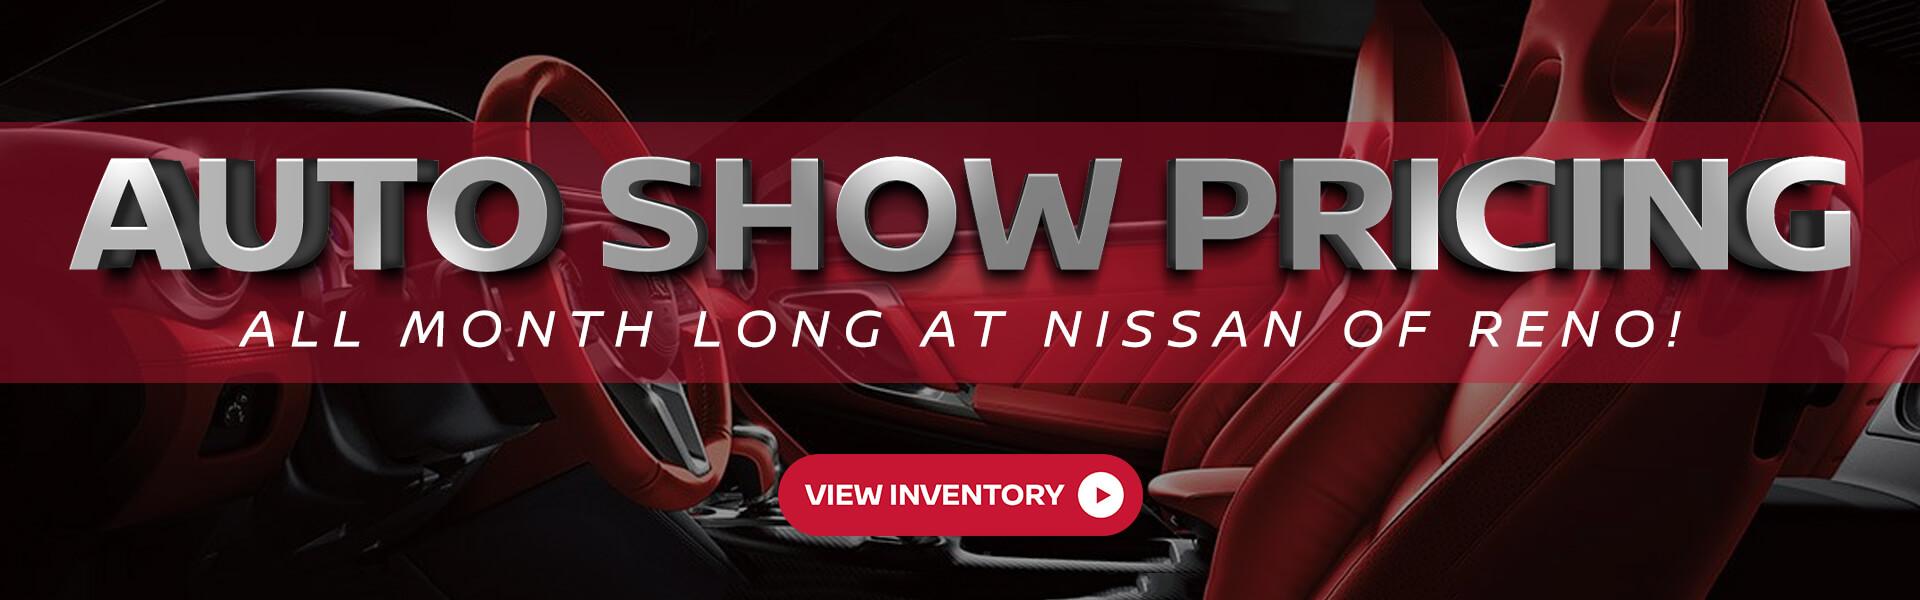 Auto Show pricing